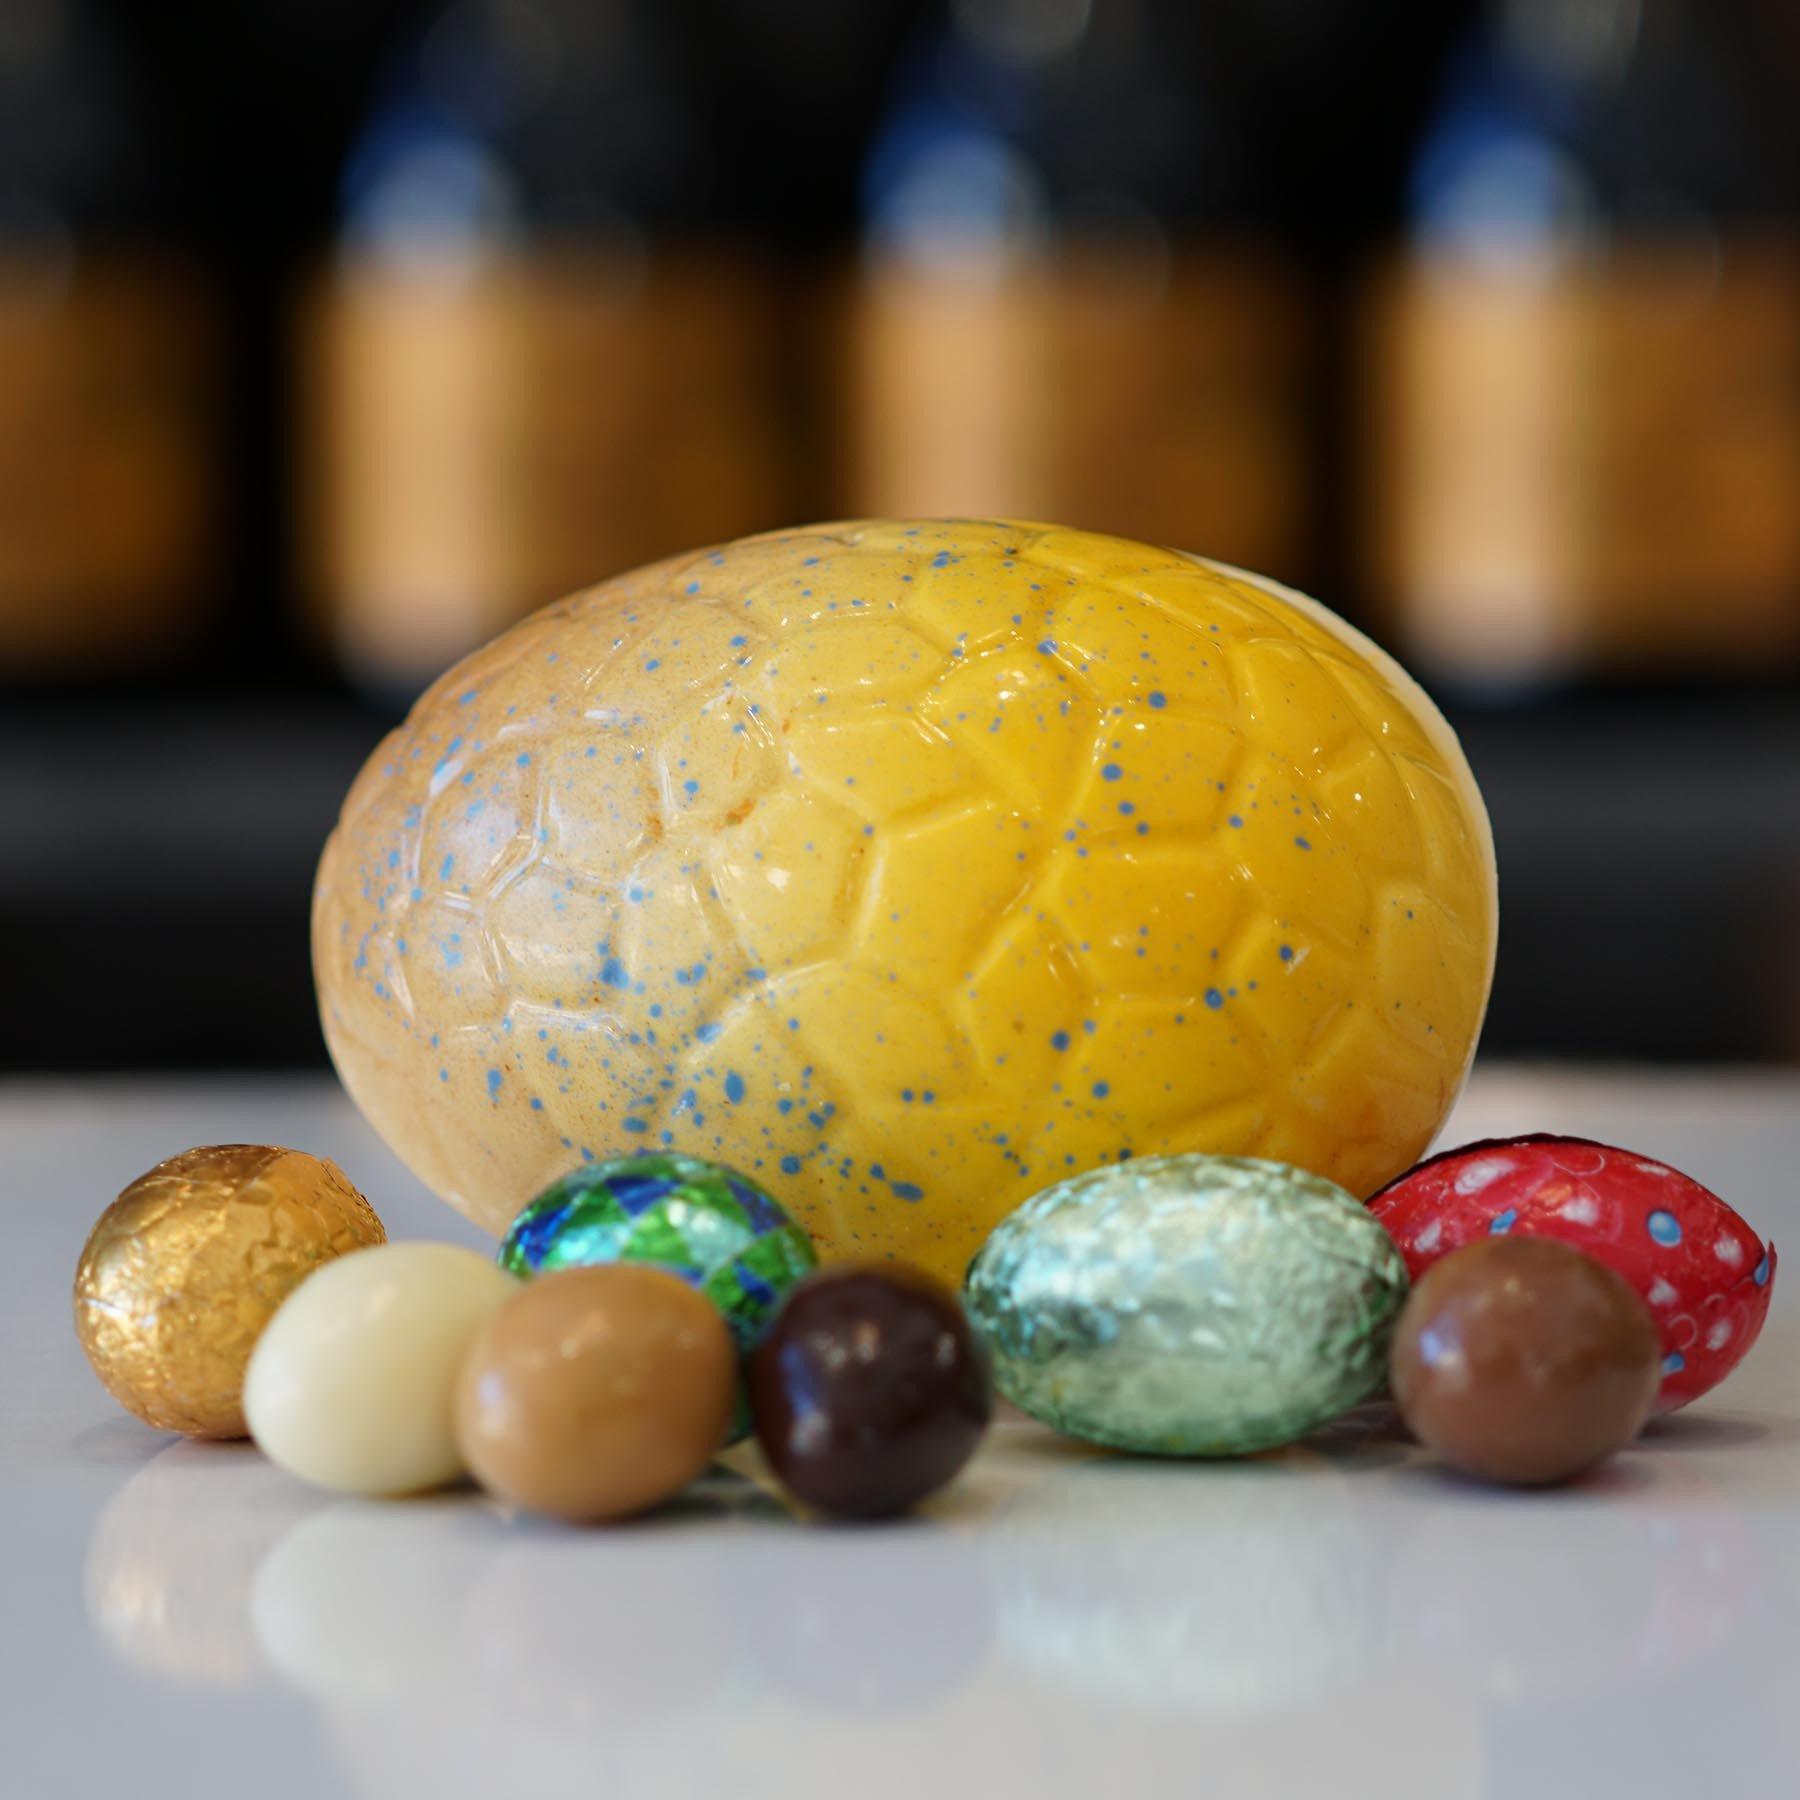 Oeuf de Pâques en chocolat